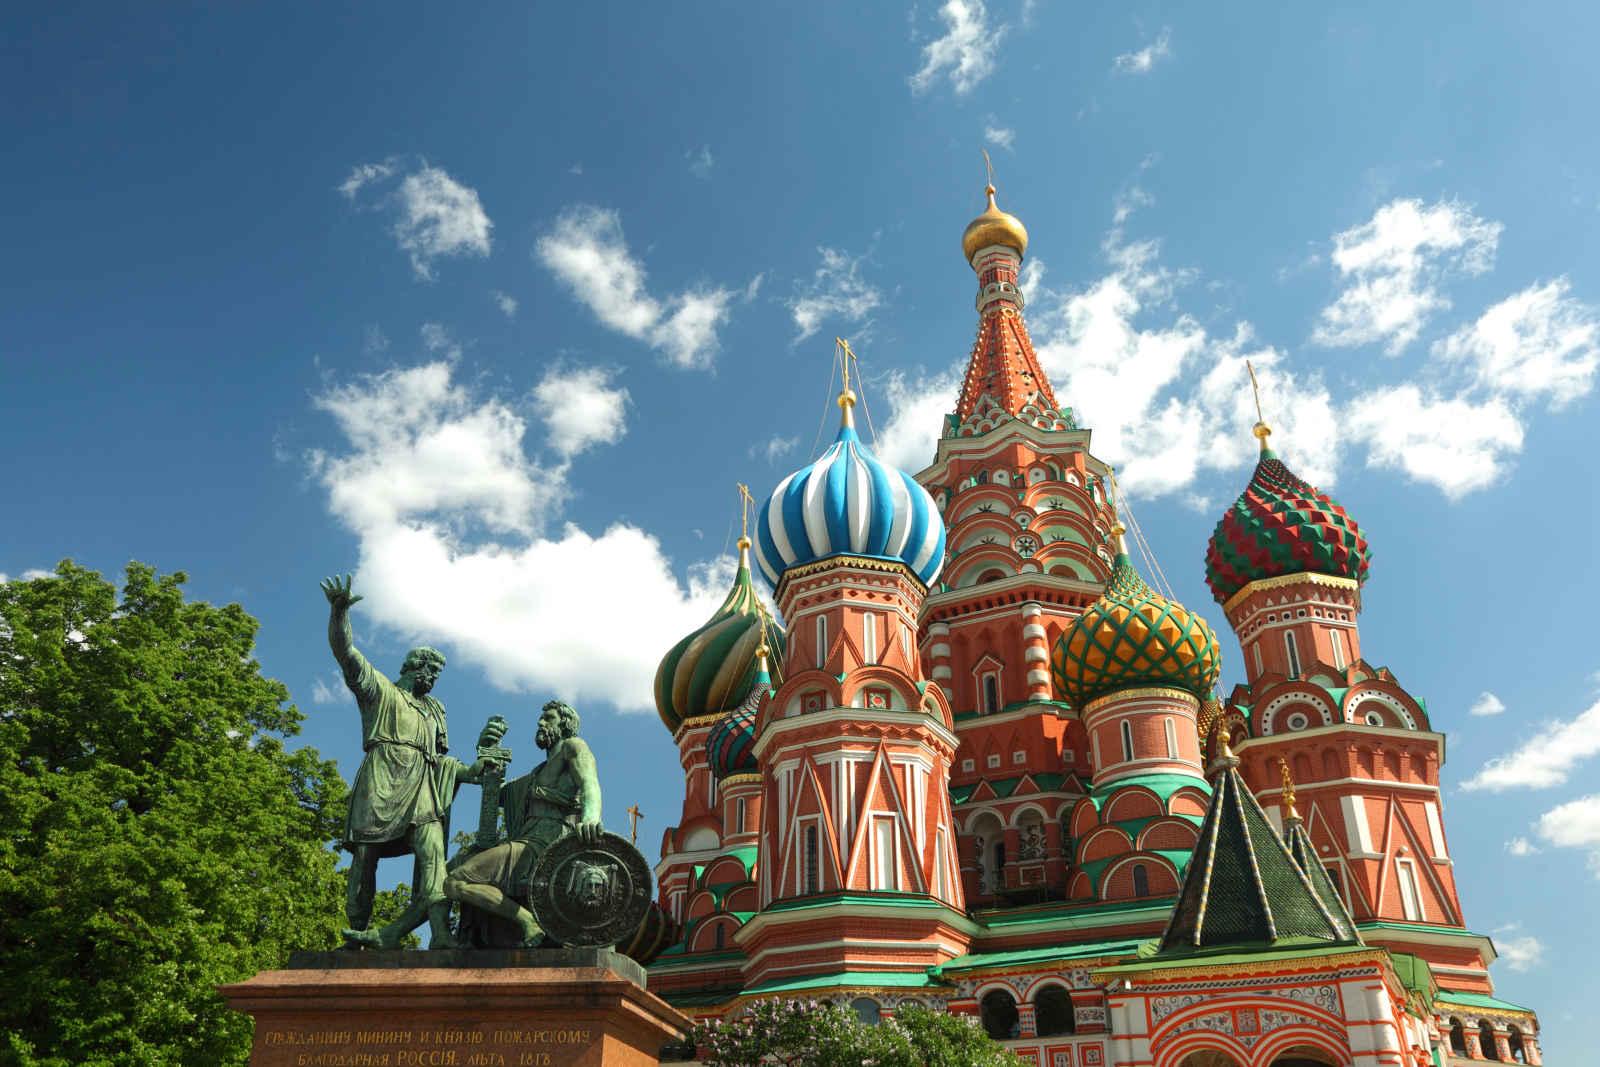 Russie : Héritage des tsars de Russie